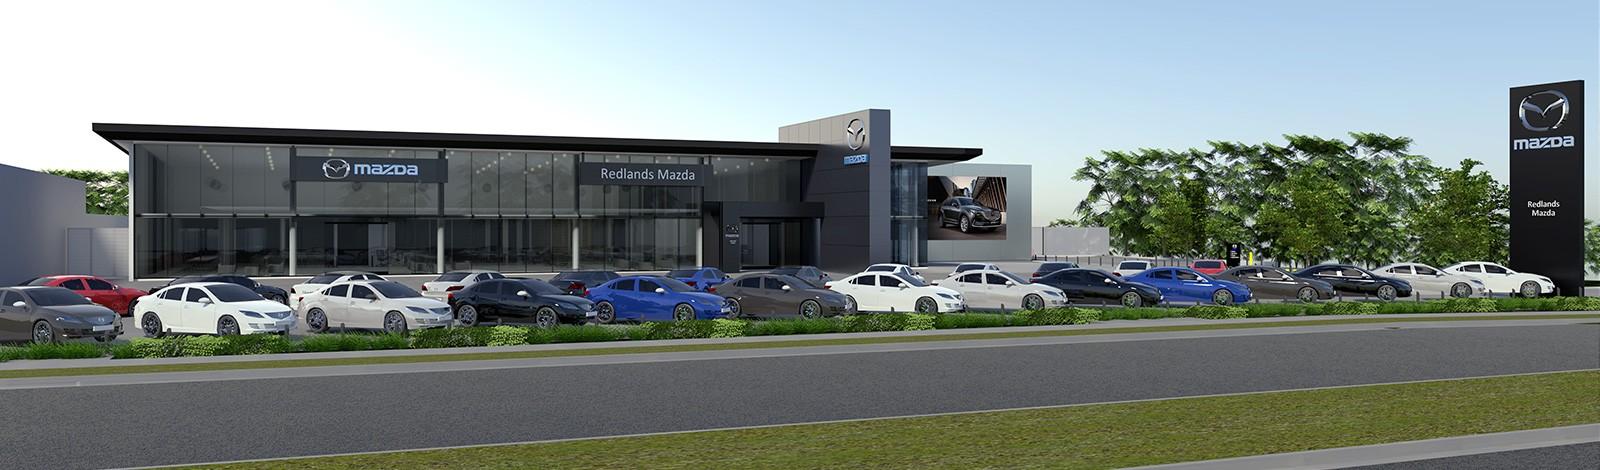 Redlands Mazda